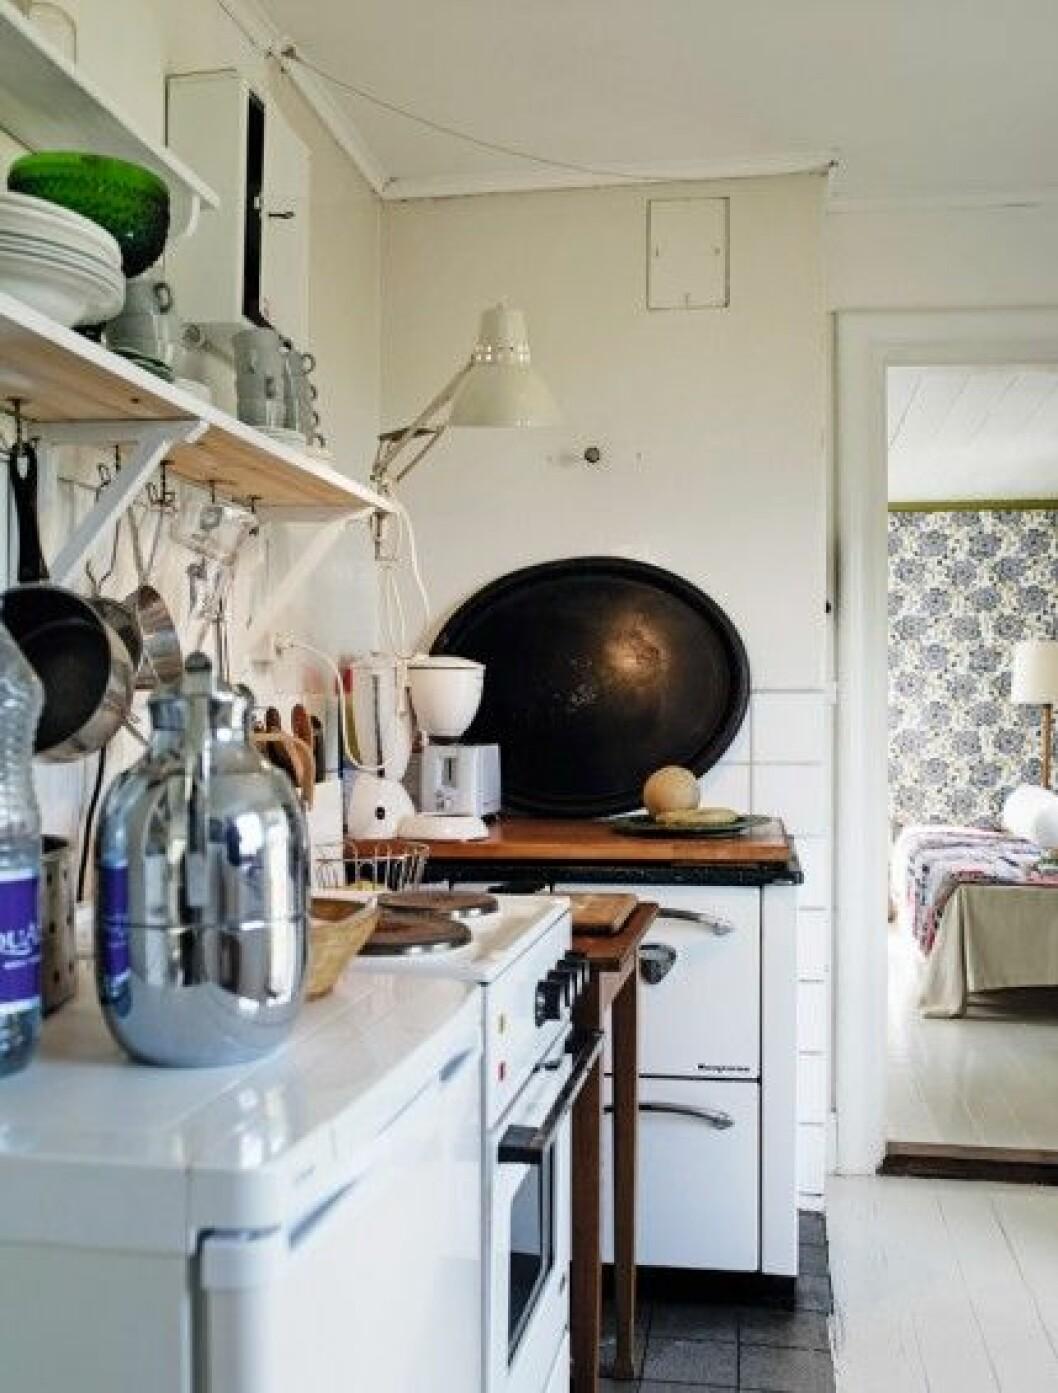 Foto-Pia-Ulin-Cilla-Ramnek-kitchen-old-school-retro-kok